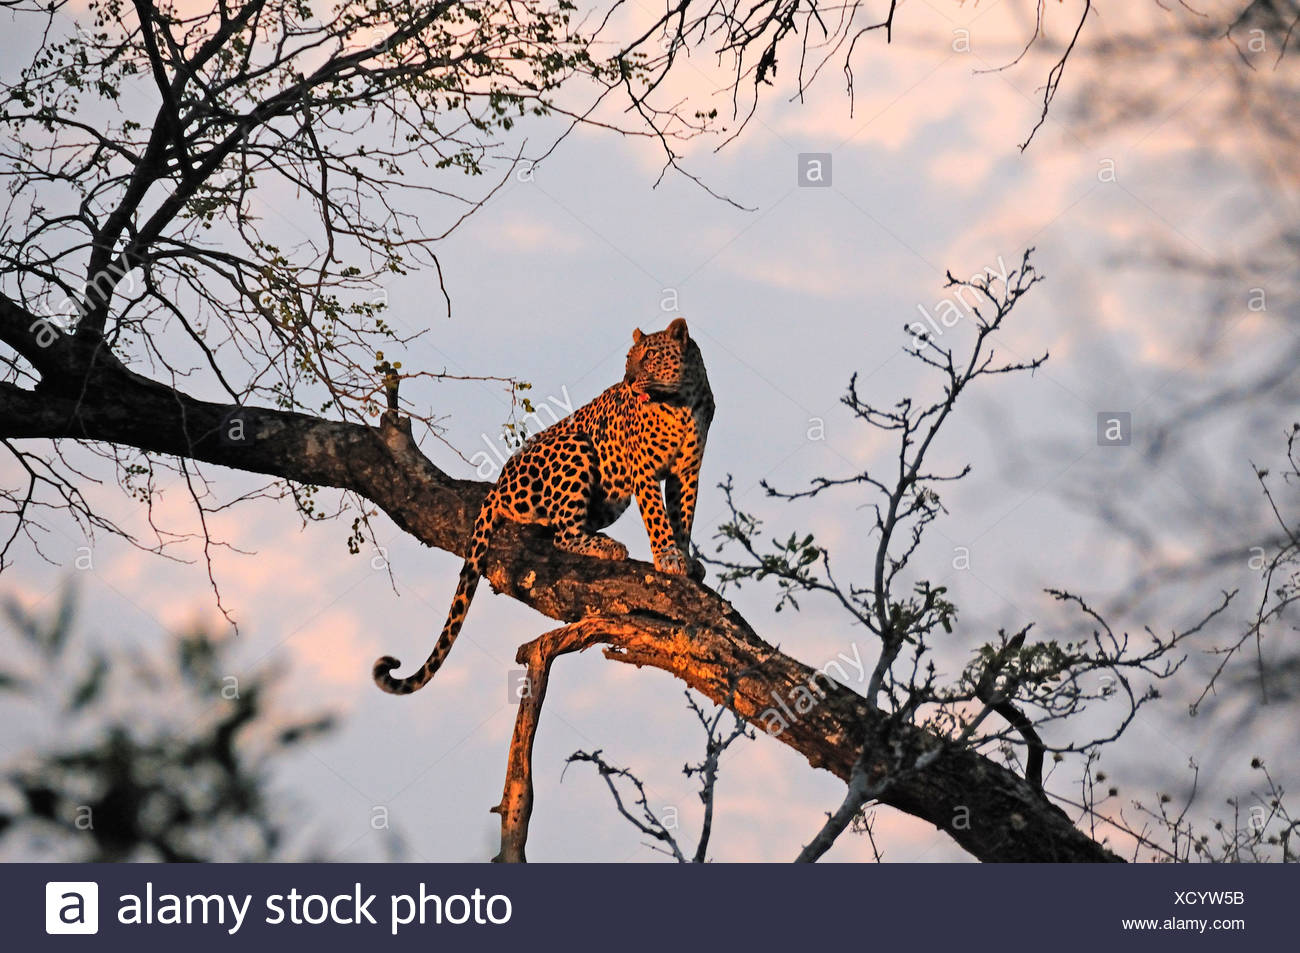 Leopard Panthera pardus Ulusaba Sir Richard Branson's Private Game Reserve Sabi Sands Game Reserve Mpumalanga South Africa tree - Stock Image